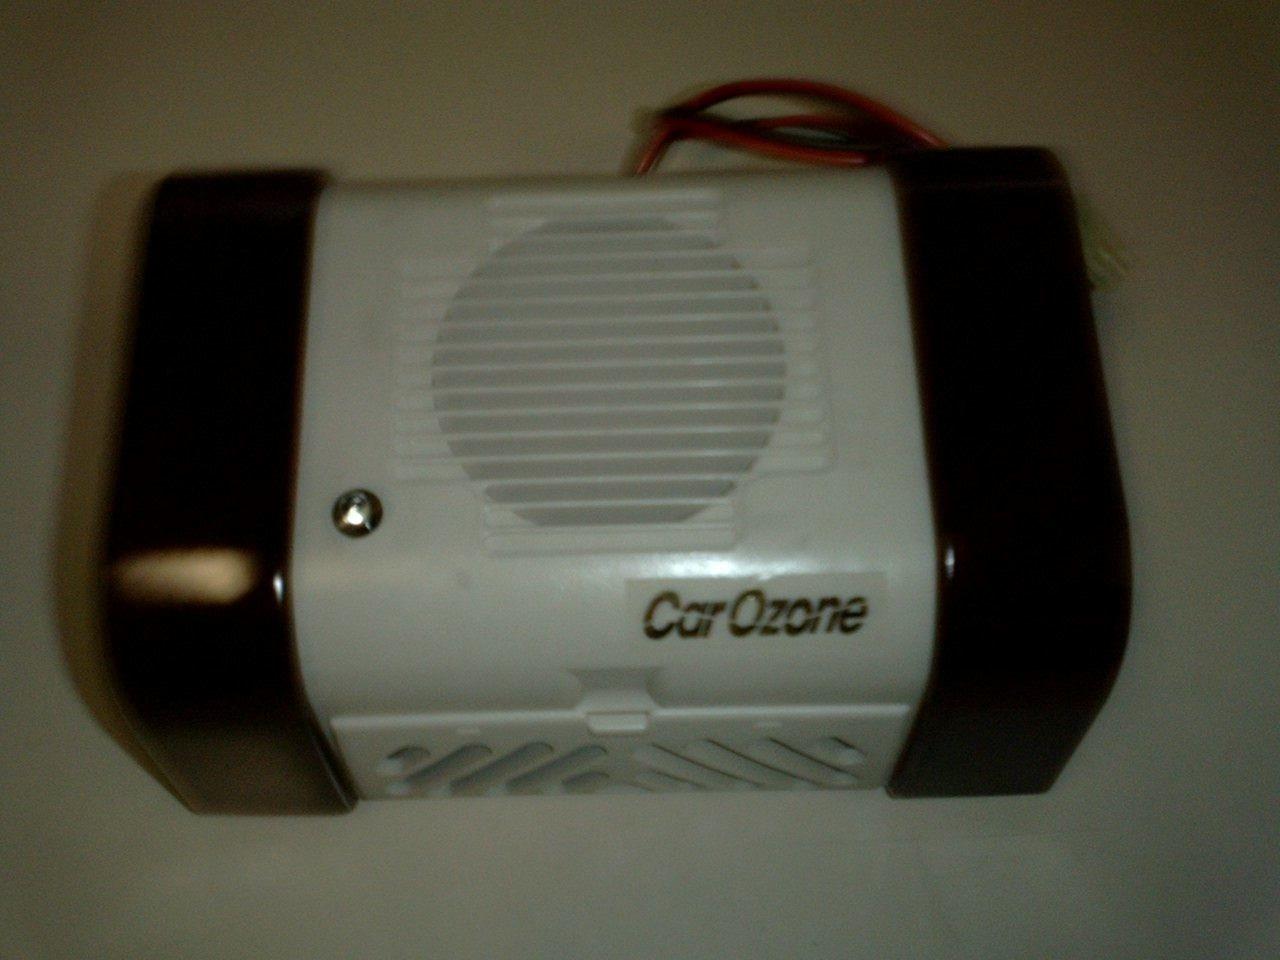 車載用オゾン発生器「CAR-OZONE」(乗用車専用)